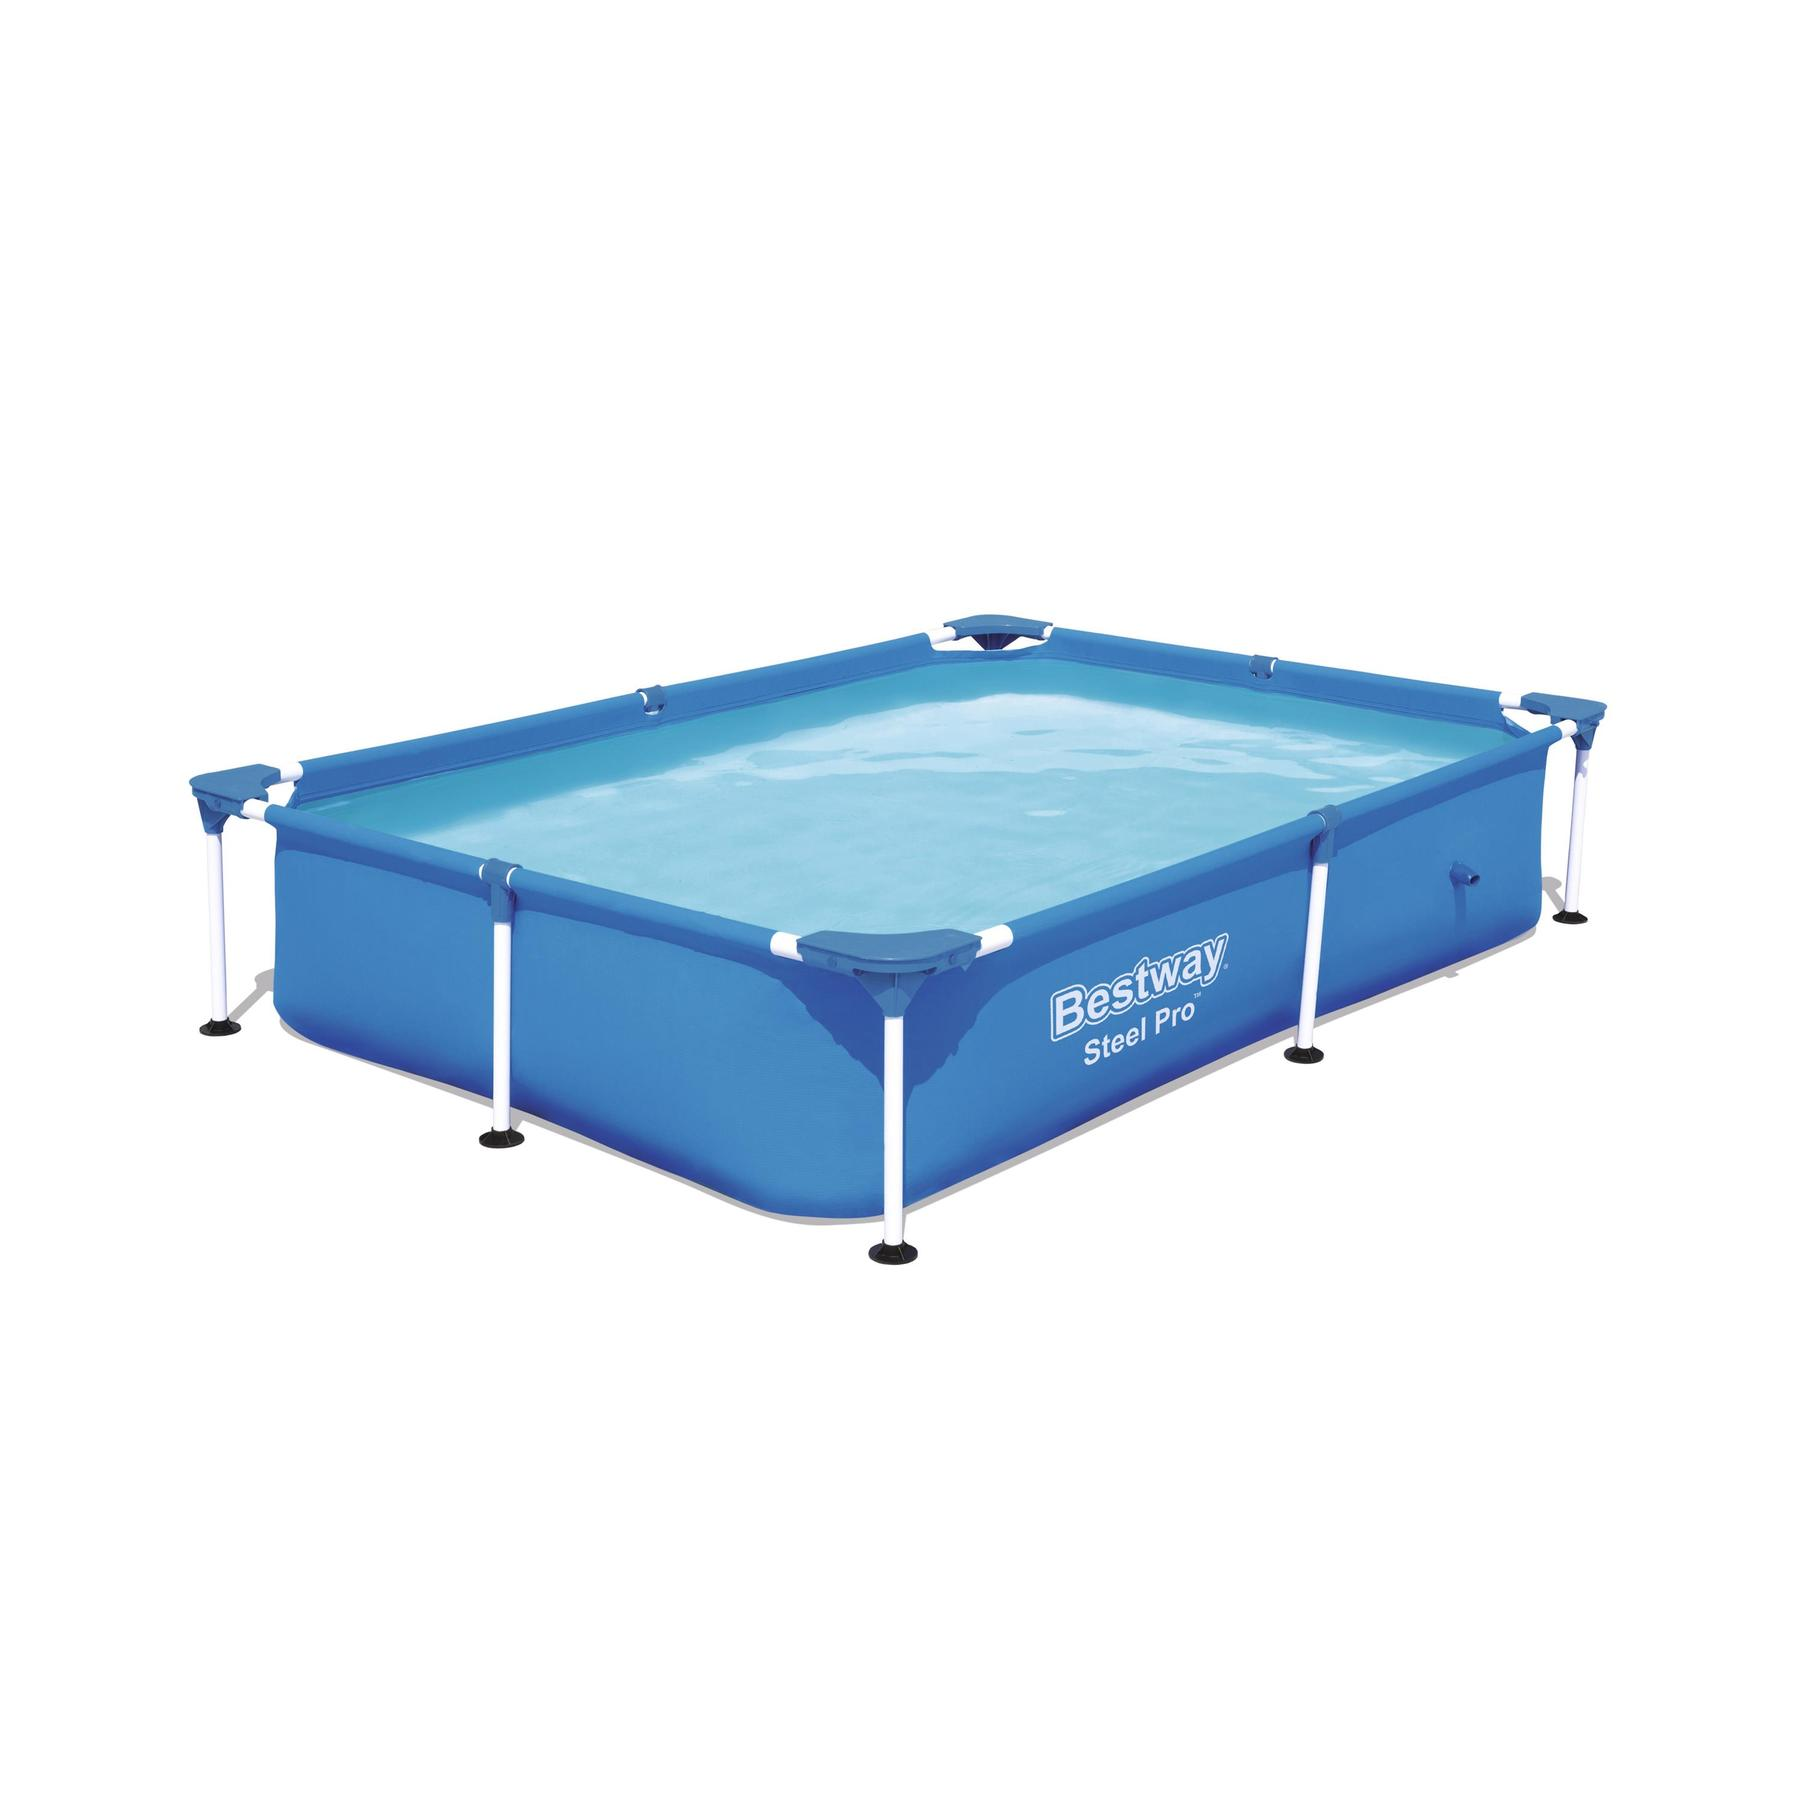 Scaffold Rectangular Pool 221 х150х43 Cm, 1200 L, Bestway Splash Jr. Frame Pool, Item No. 56401